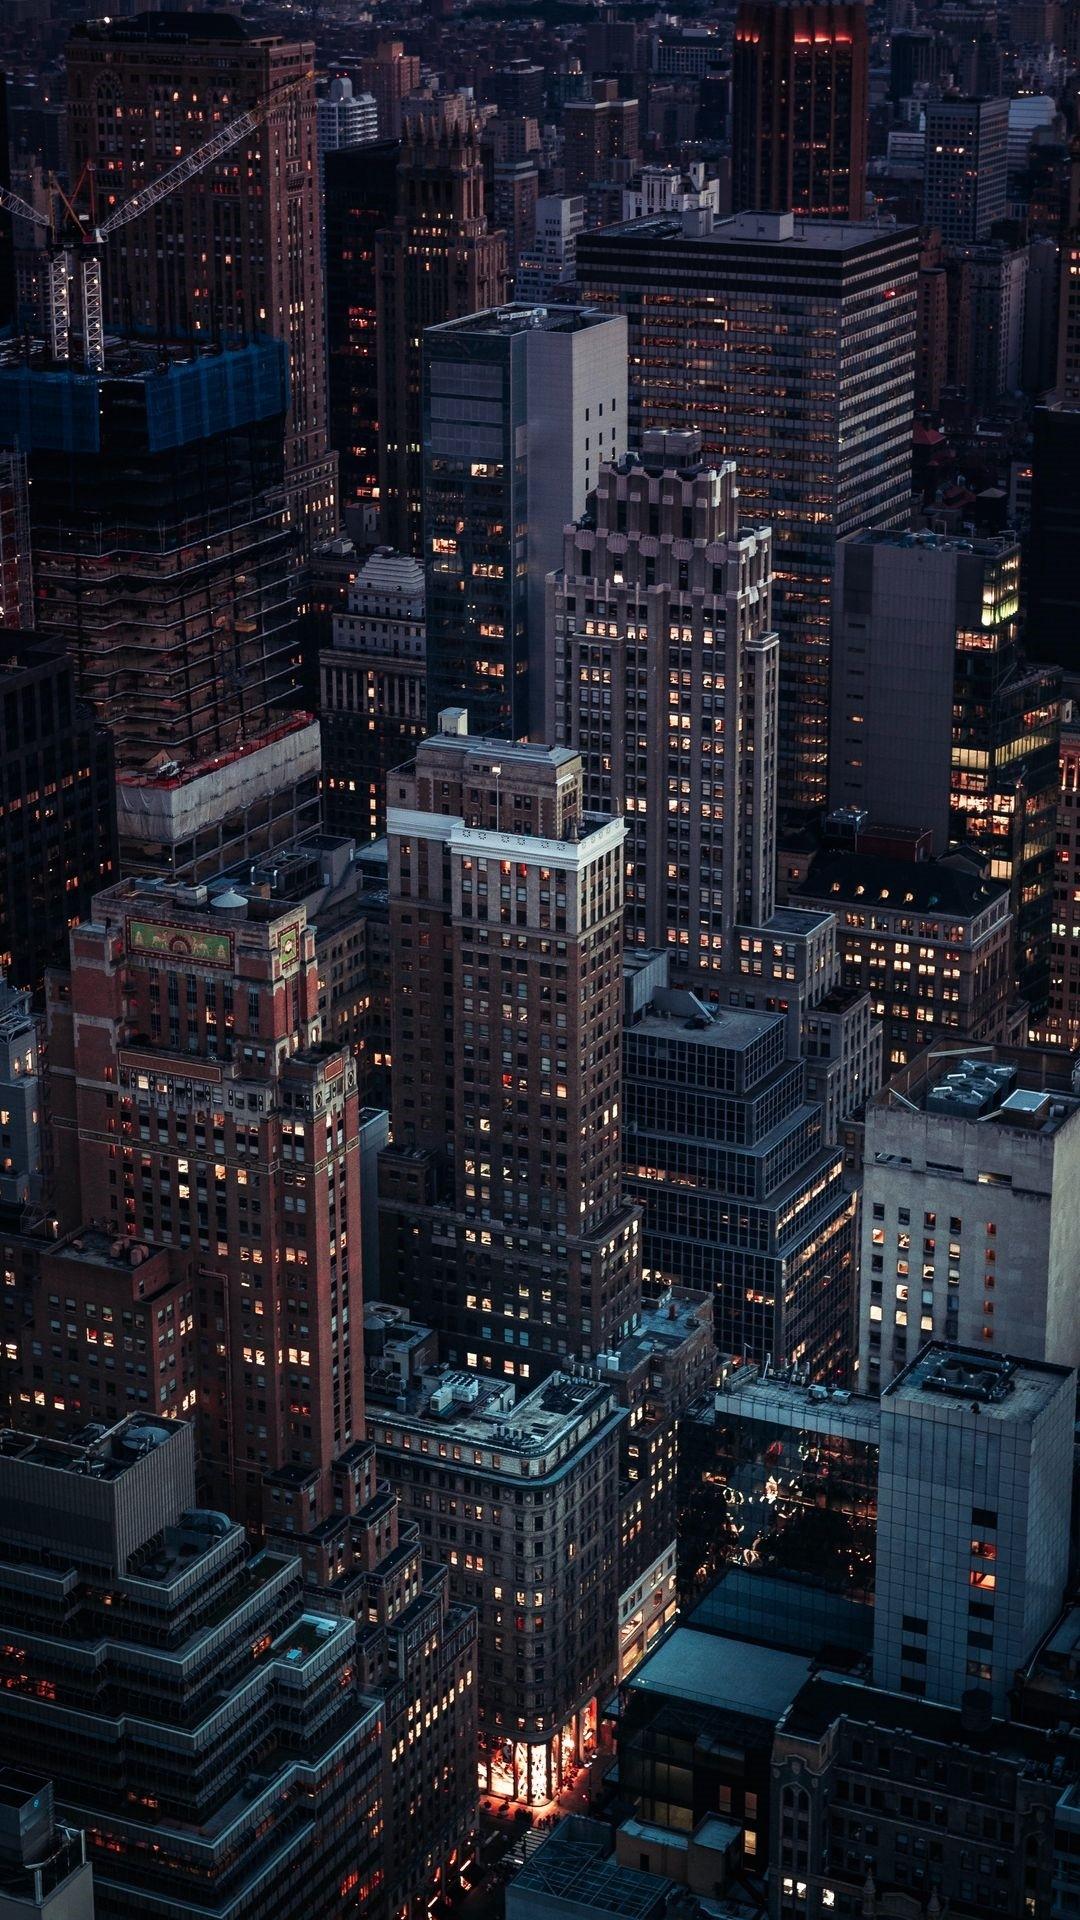 City iphone 6 wallpaper